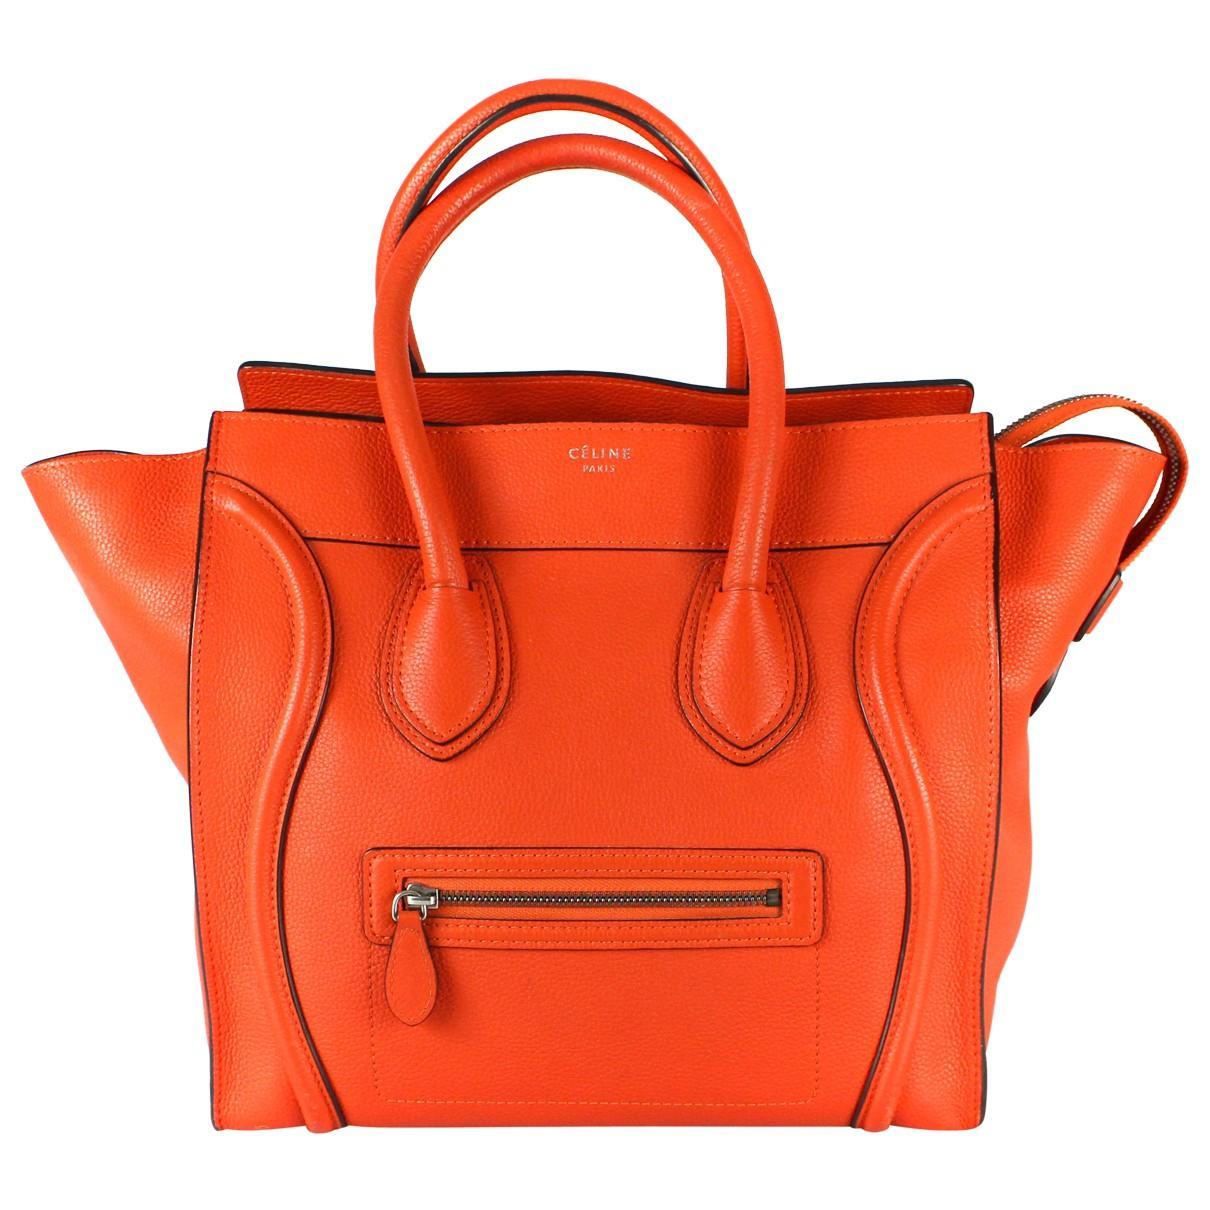 263af9fbc7 Céline Pre-owned Luggage Phantom Leather Tote in Orange - Lyst